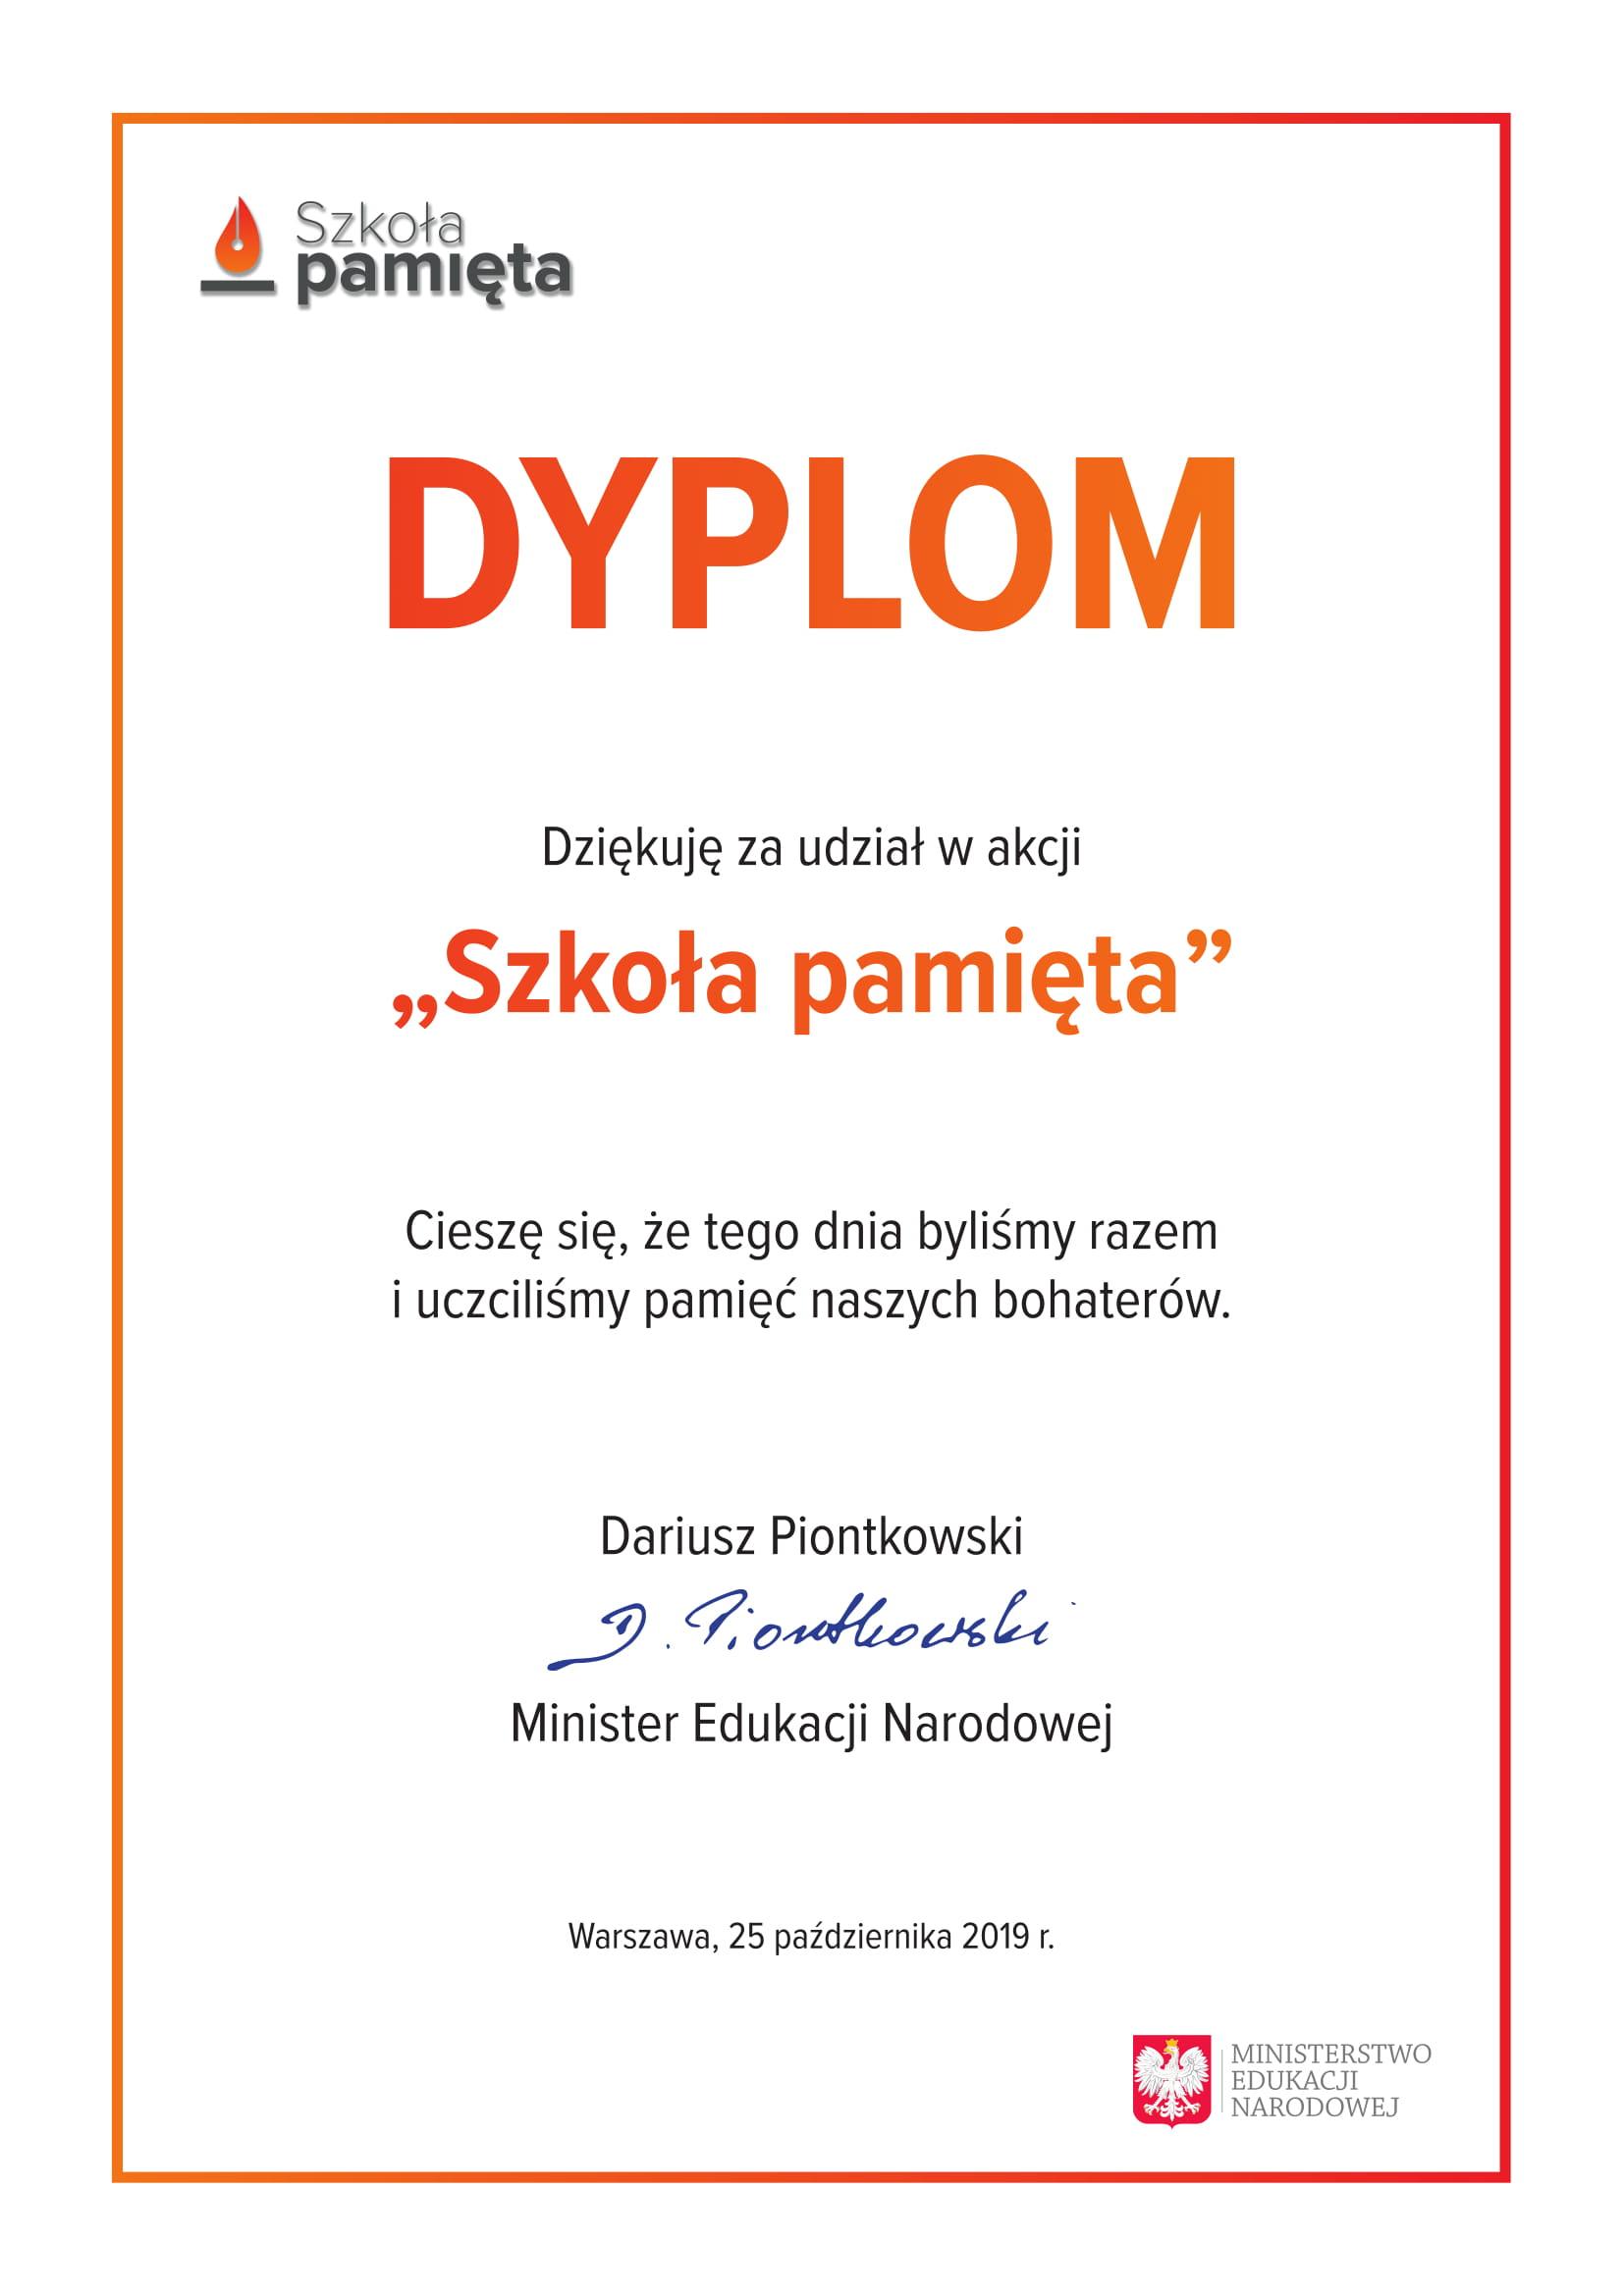 Dyplom-Szkoła-pamięta-1.jpg